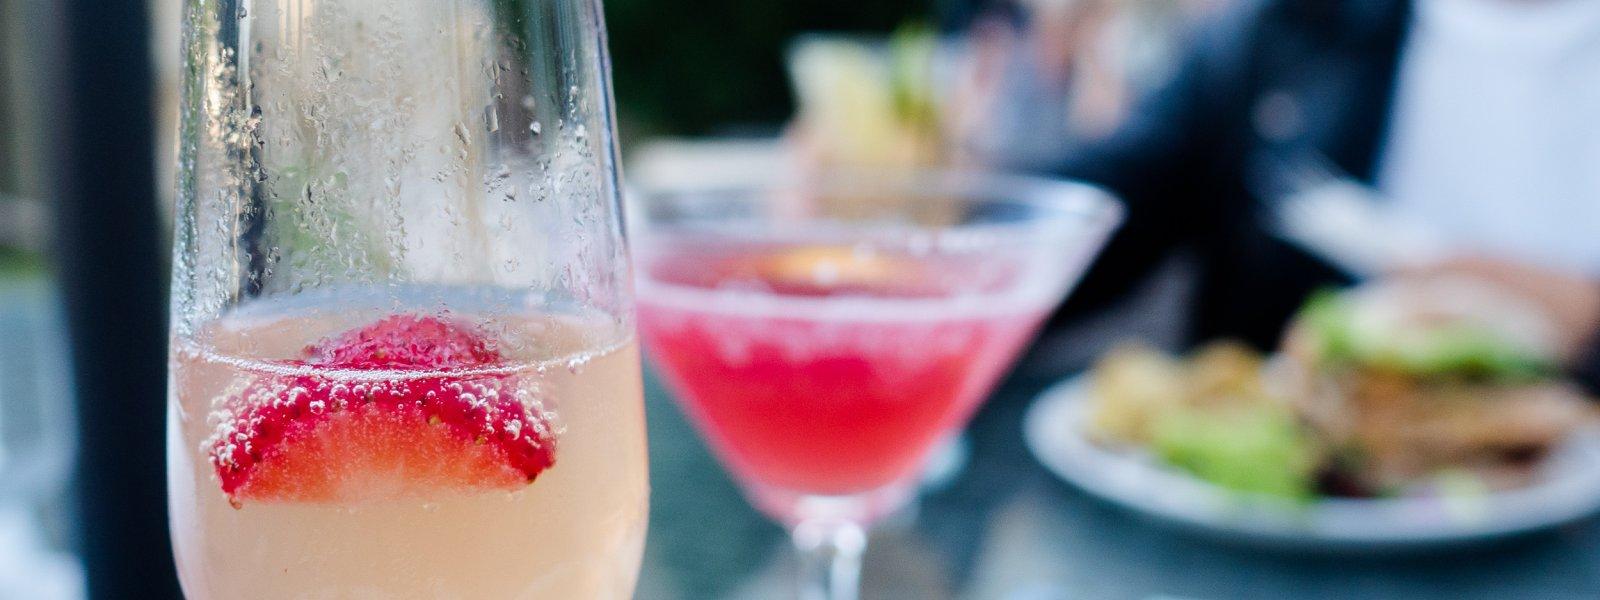 Cocktails & Al Fresco Dining in Truro at The Alverton Hotel